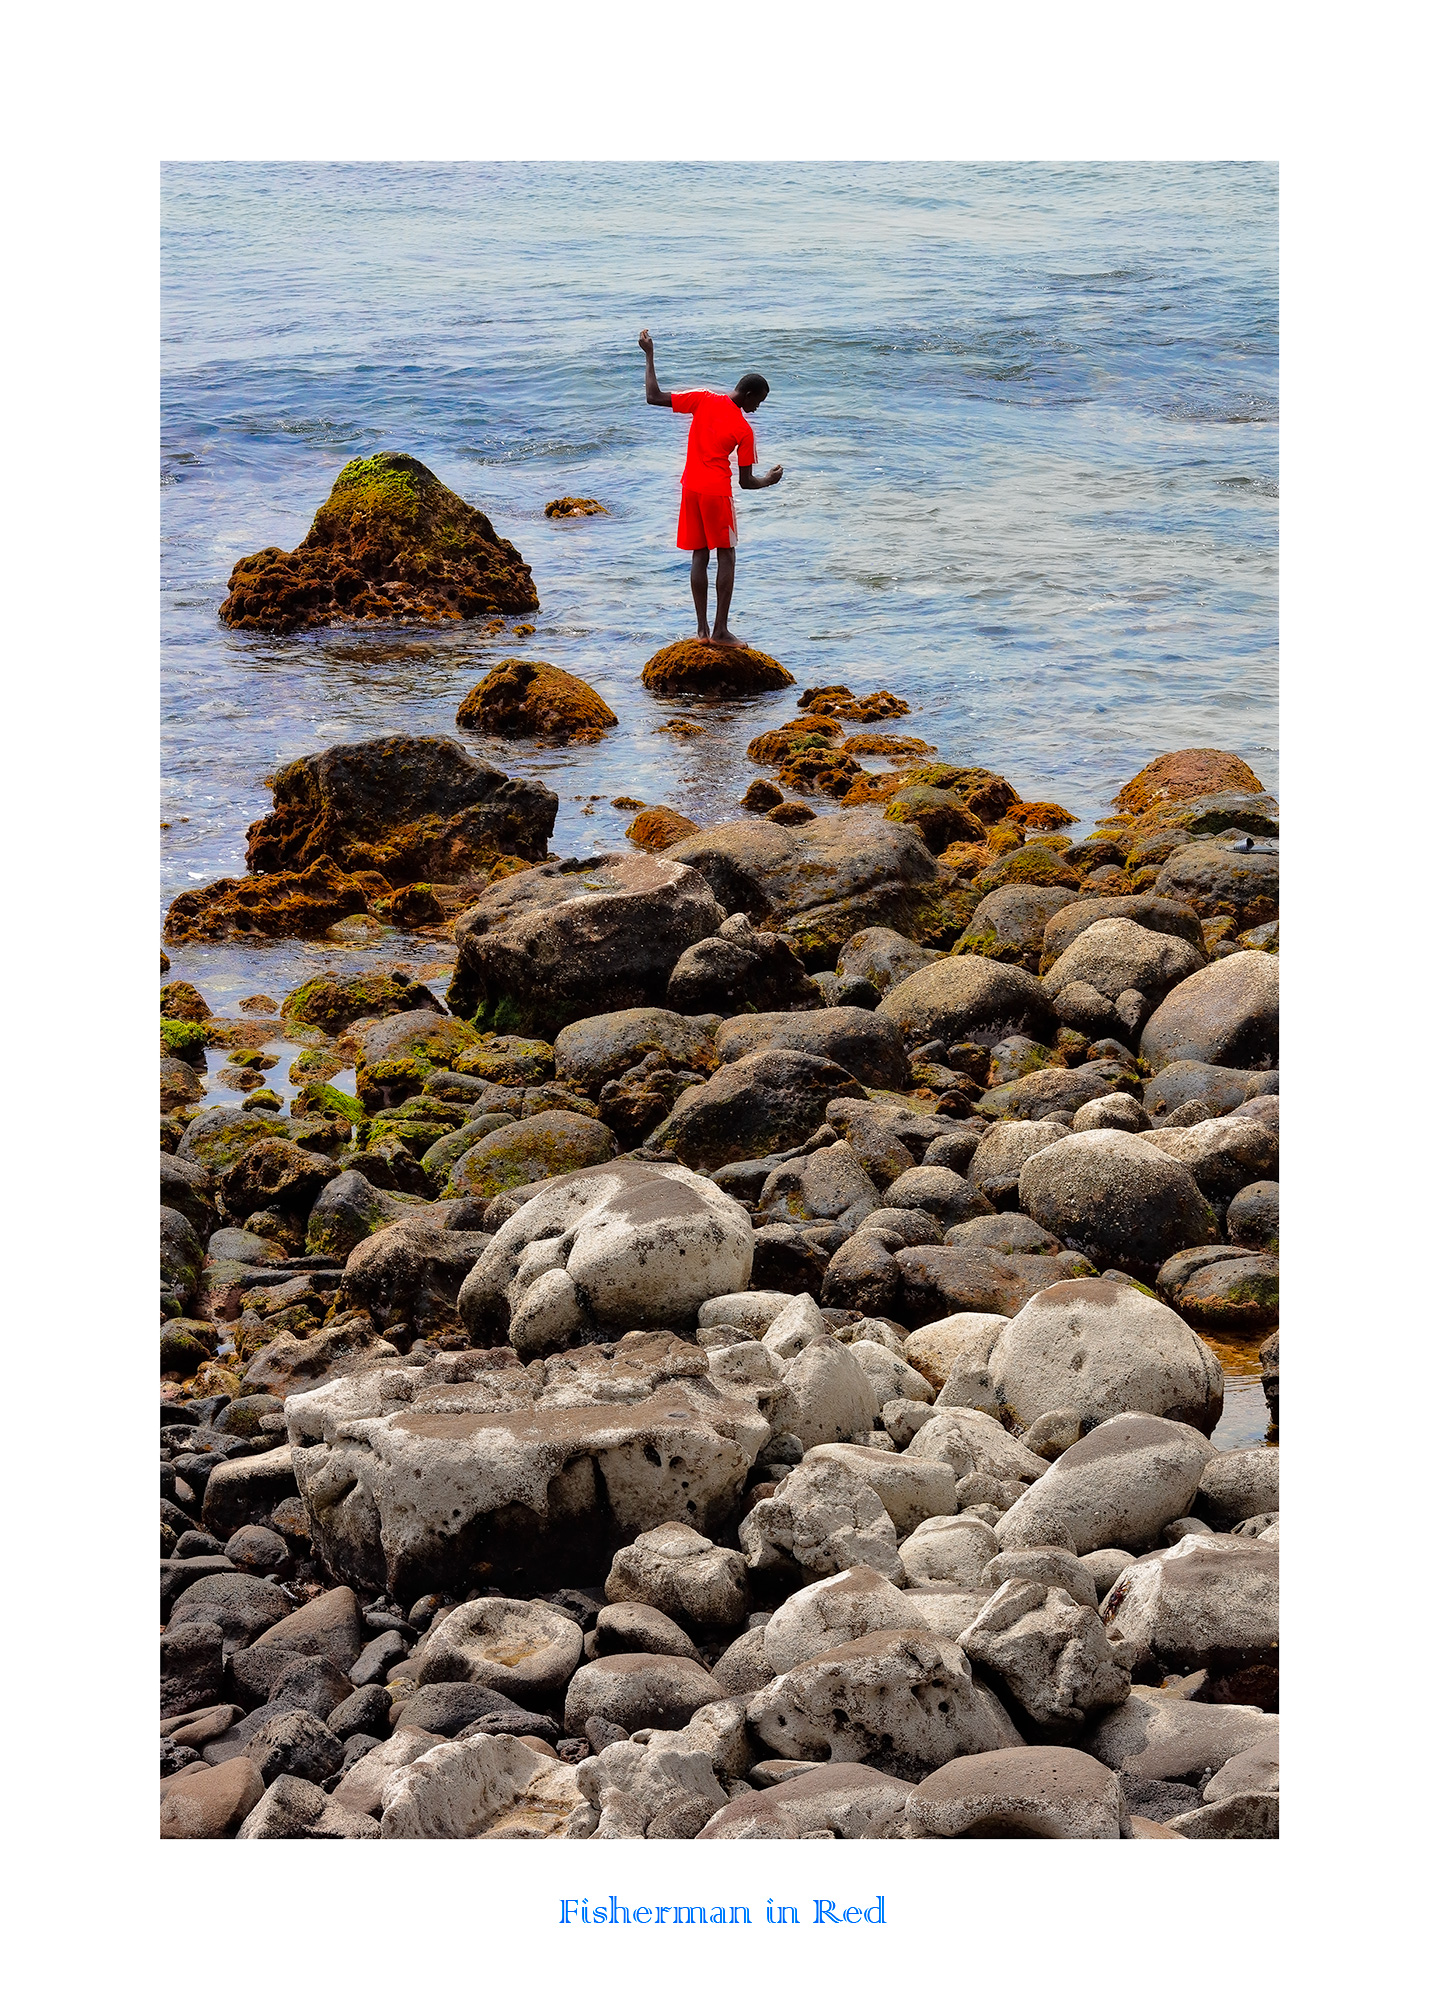 Fisherman in Red...